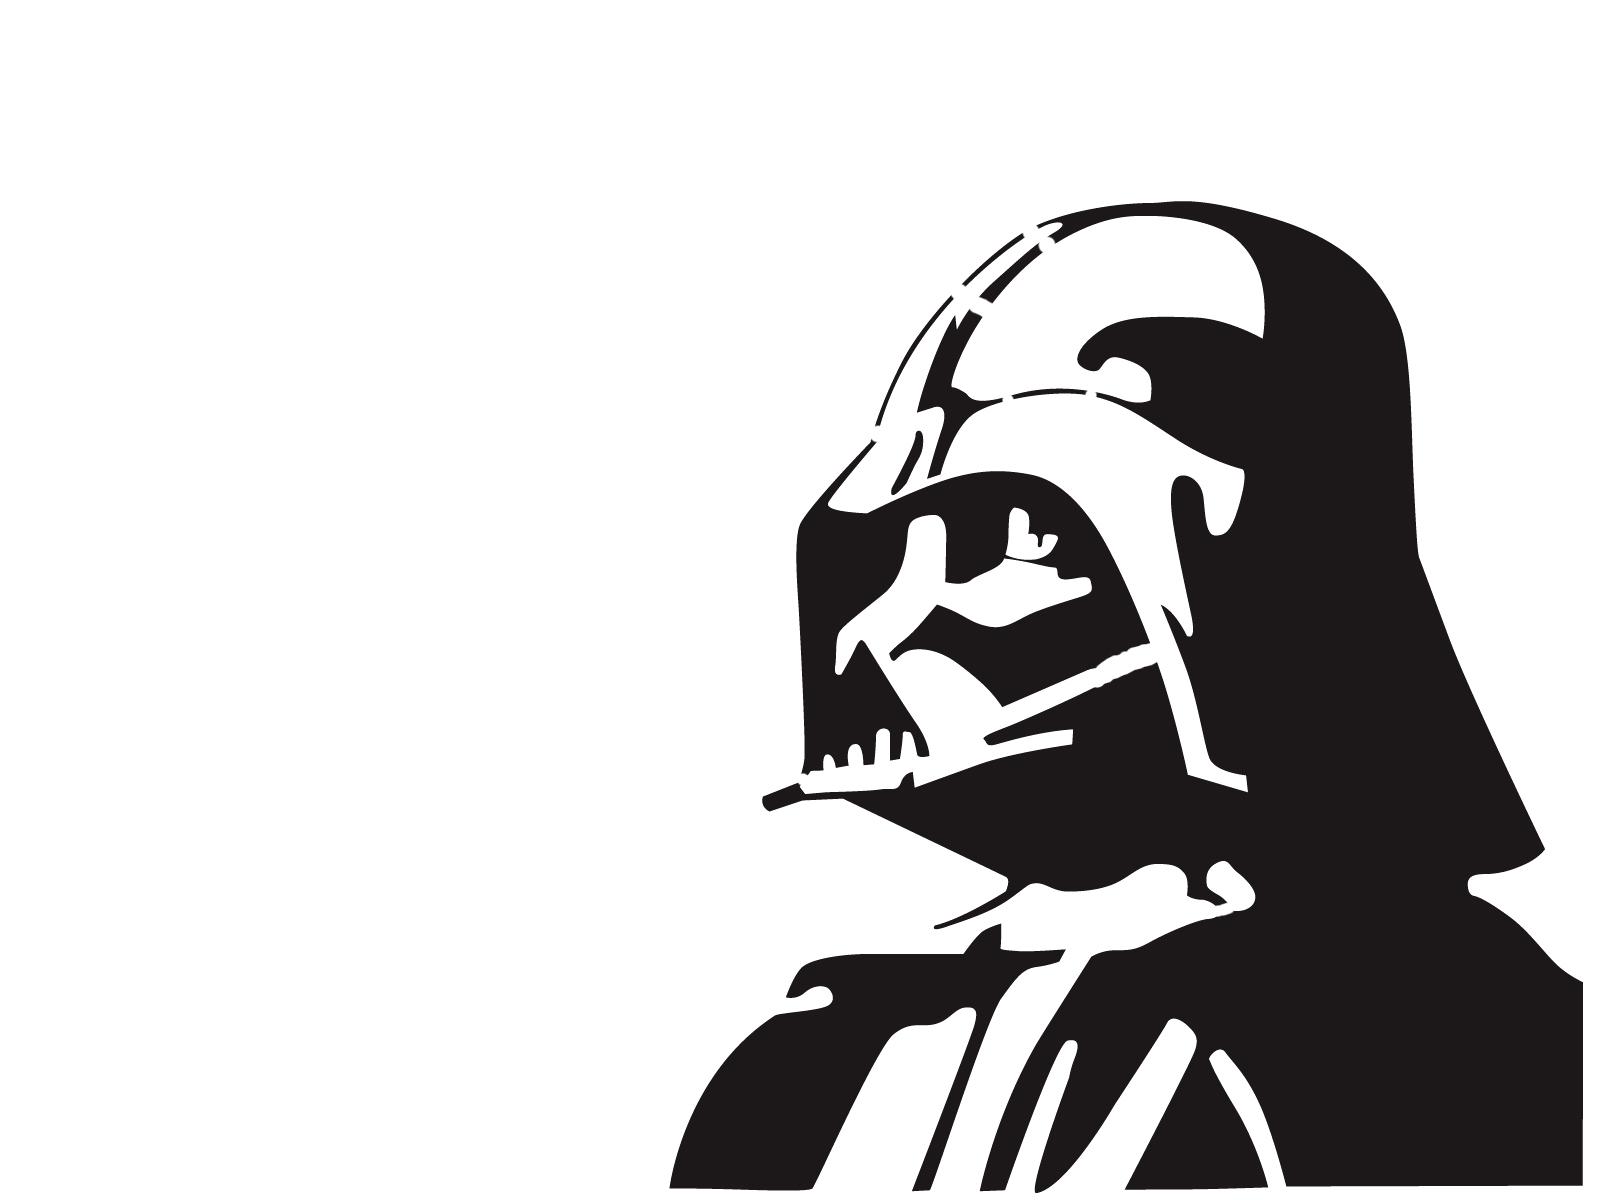 Darth Vader clipart #5, Download drawings